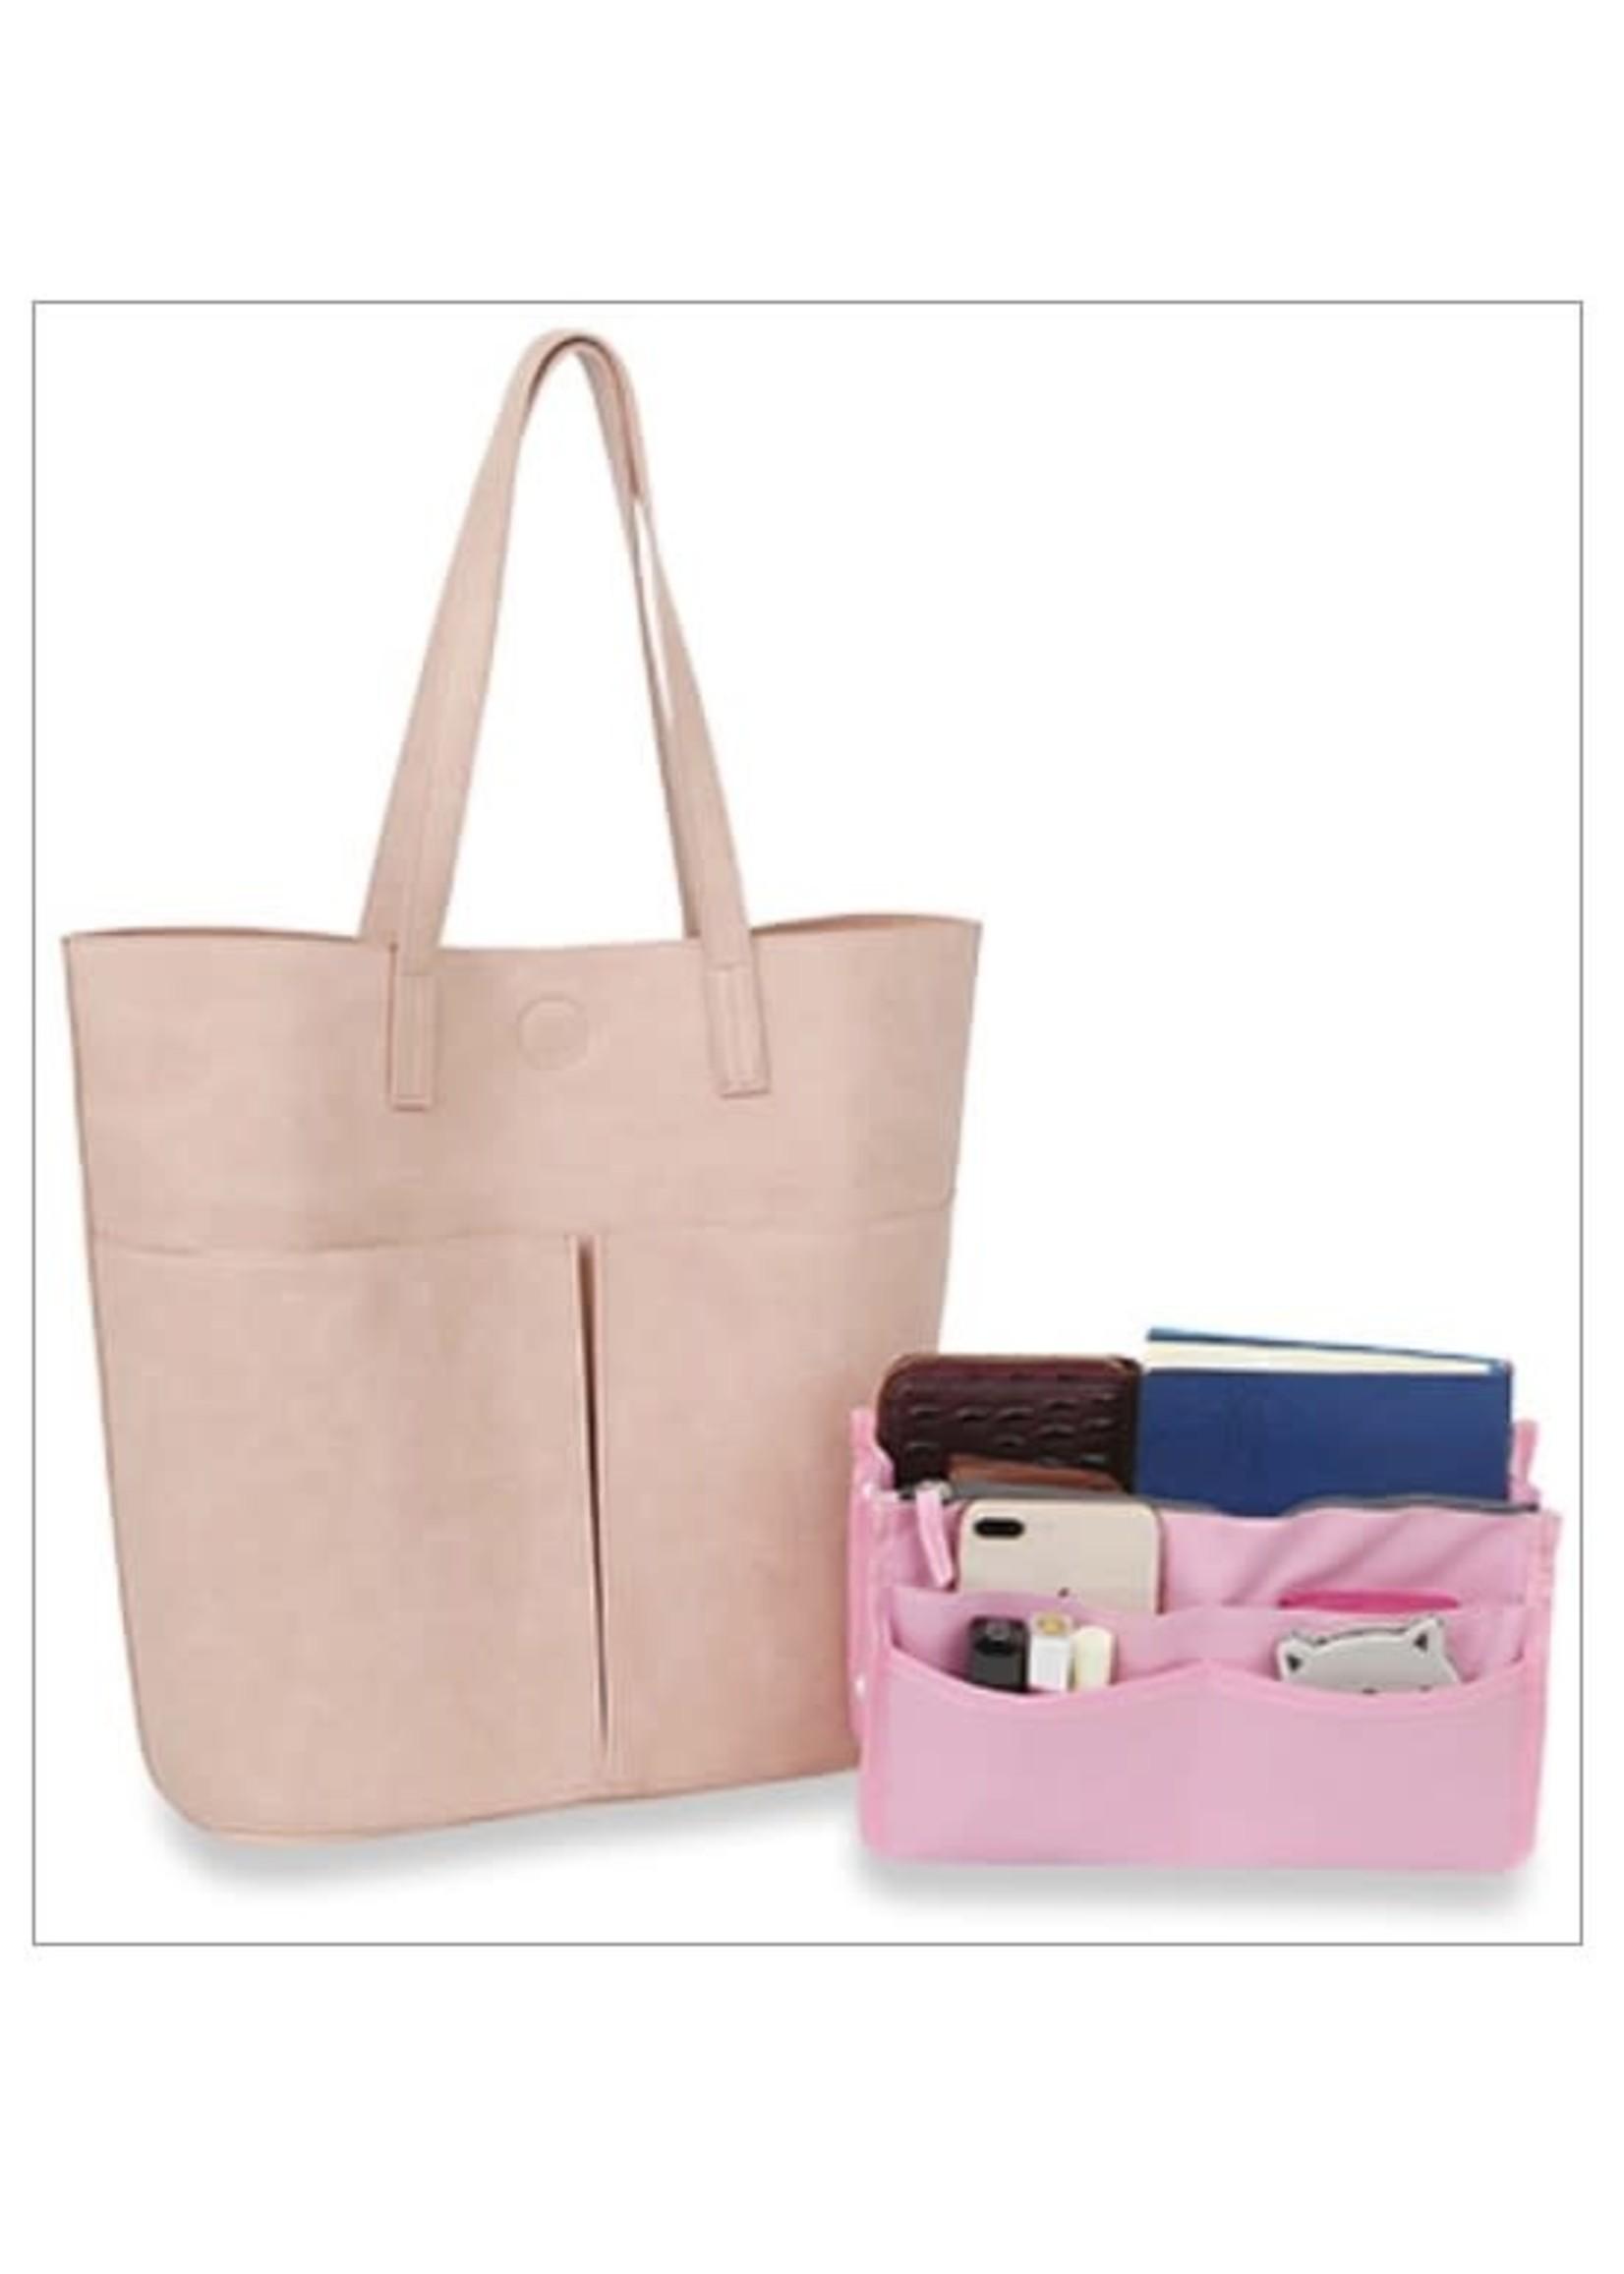 KDX Oversized Organizer Tote Handbag Set